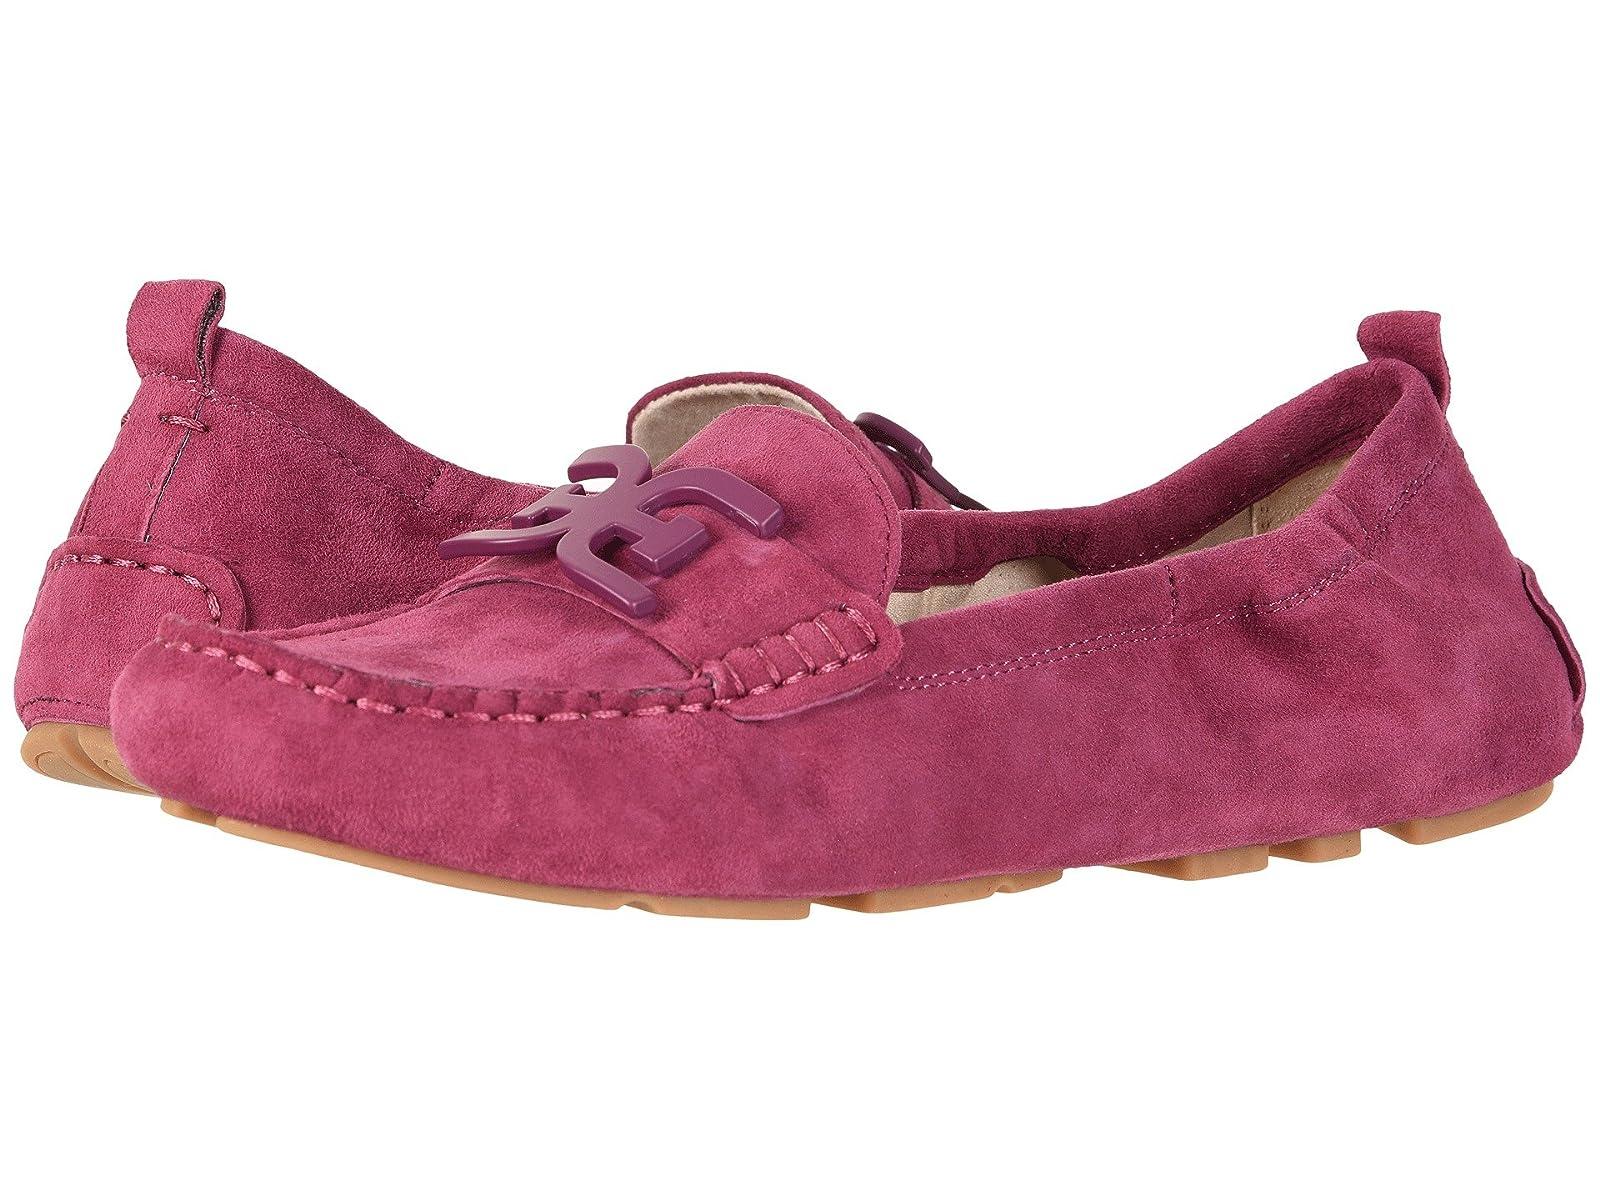 Sam Edelman FarrellCheap and distinctive eye-catching shoes